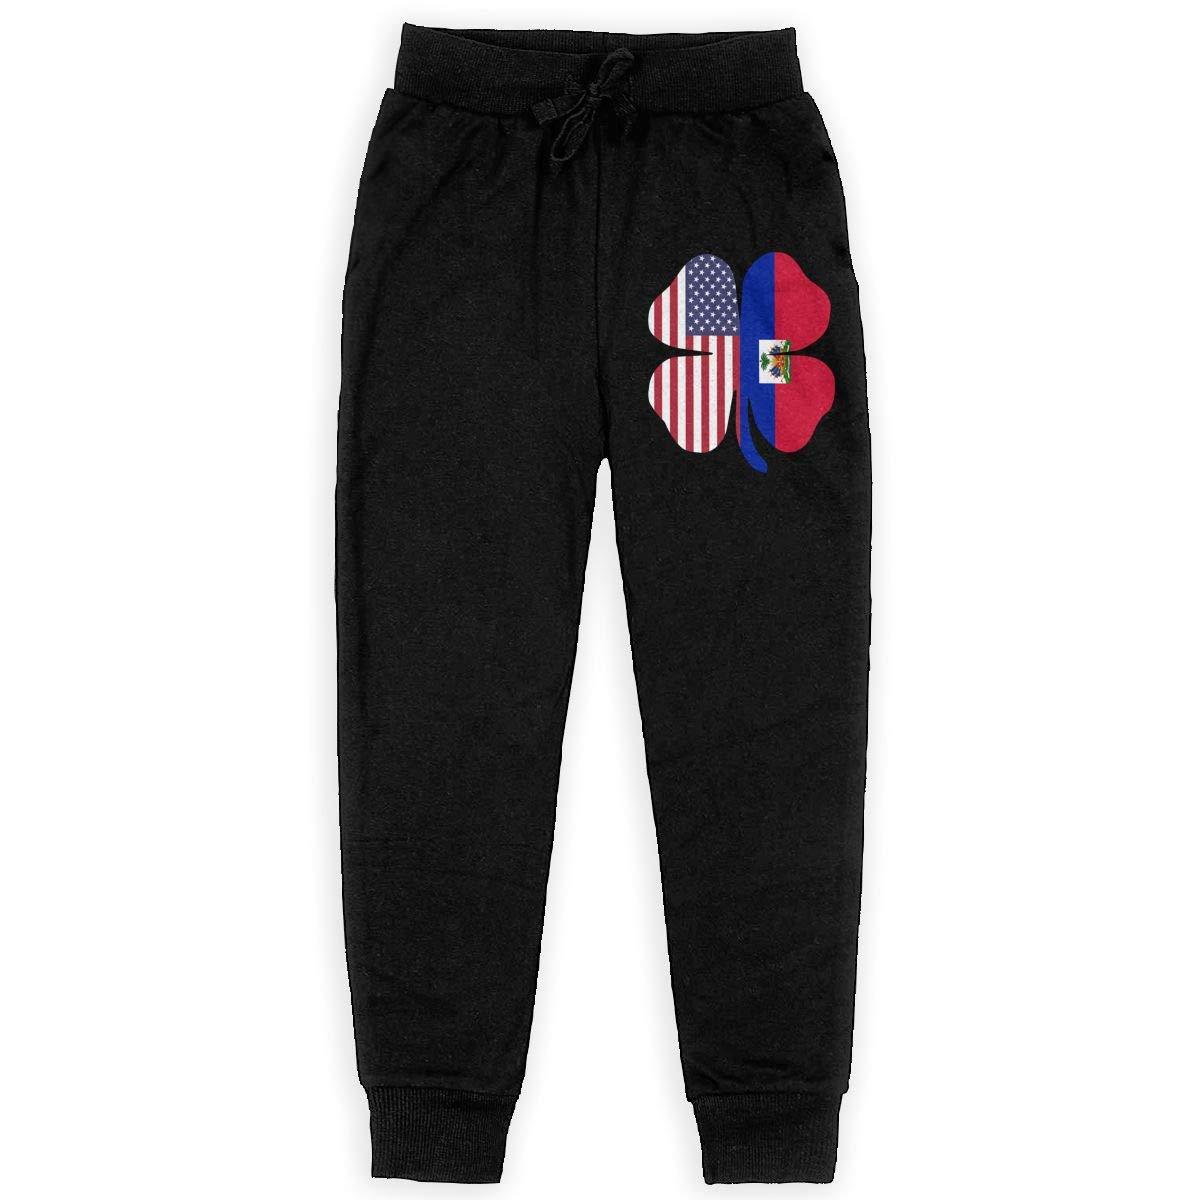 MAOYI/&J6 Haiti Flag Long Sweatpants Teenager Boys Girls Casual Pants with Pockets